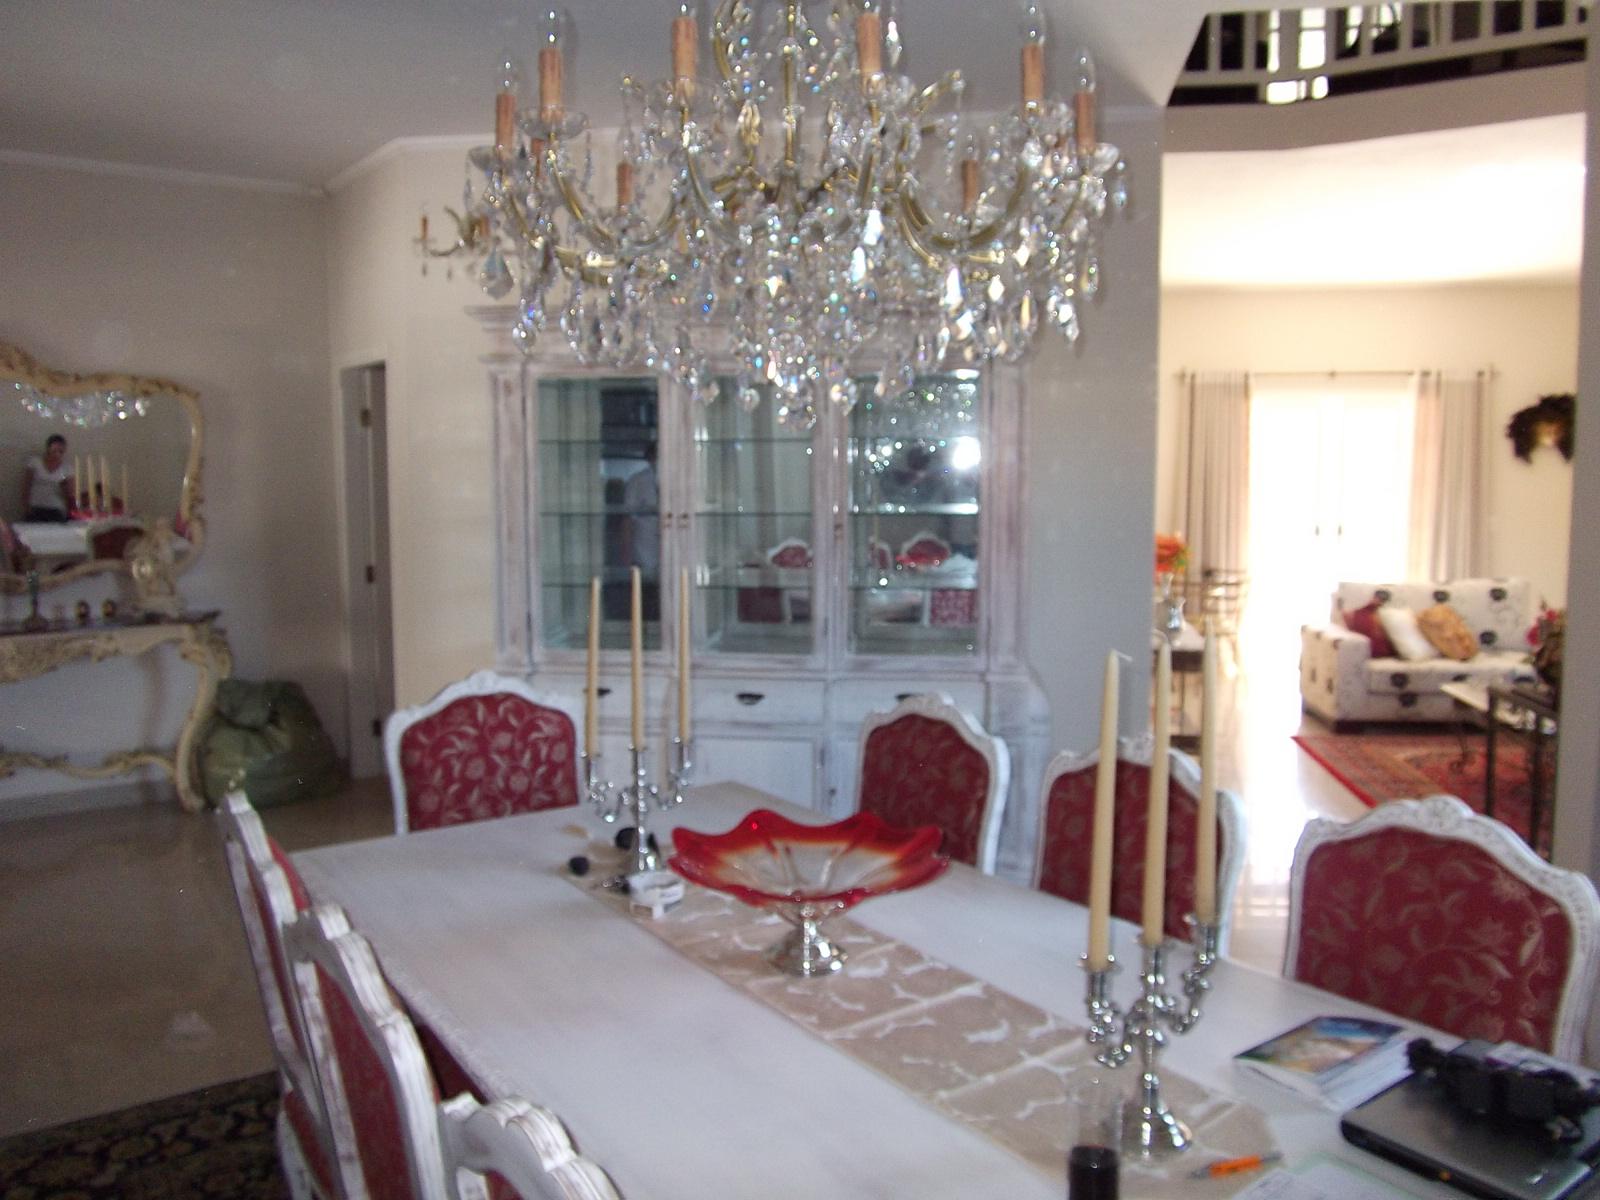 decoracao de interiores sao joao da madeira : decoracao de interiores sao joao da madeira:Sala De Jantar